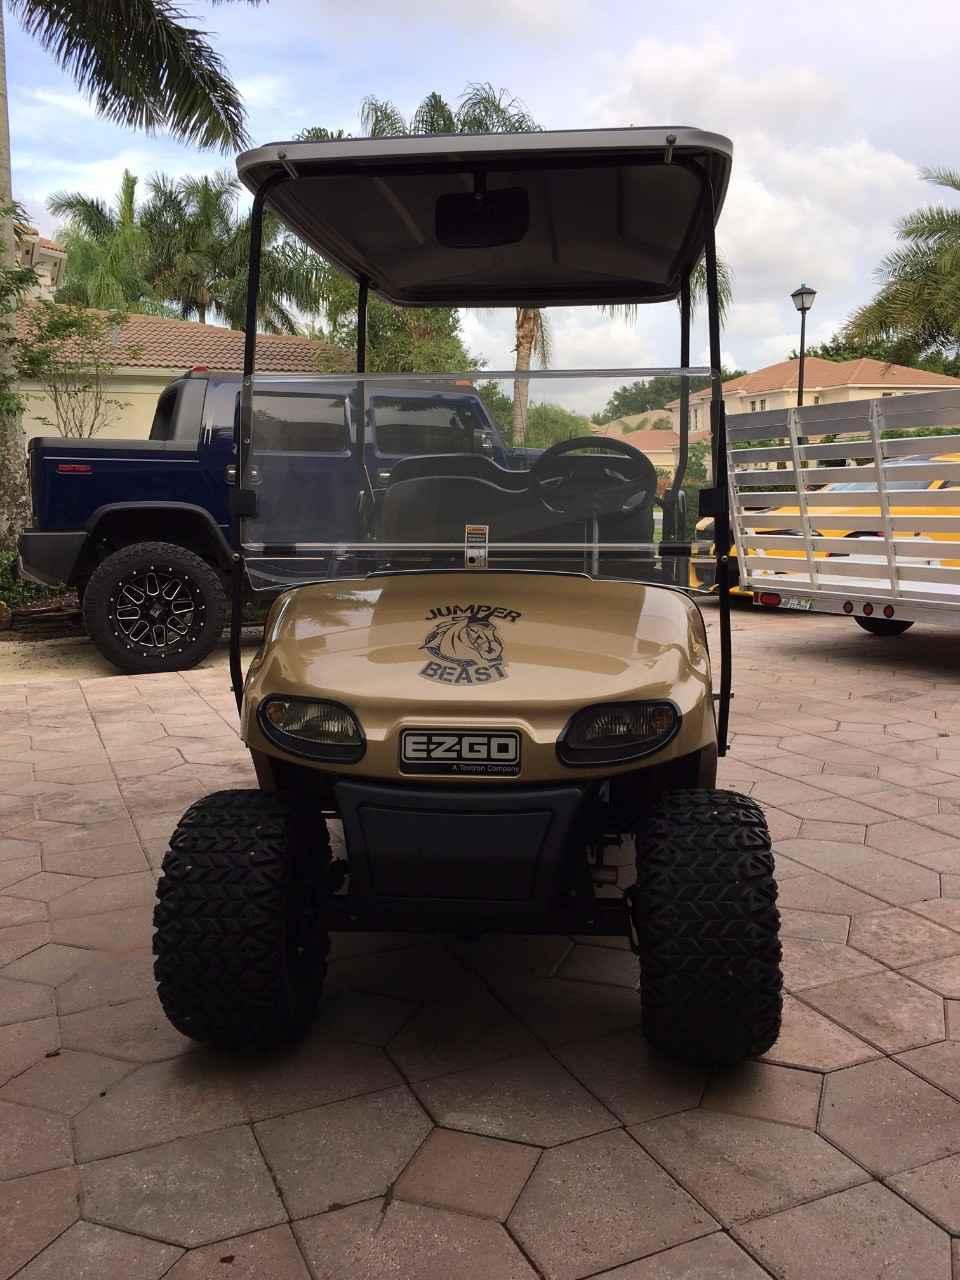 2016 Ezgo Golf Carts Models. Melex Golf Cart Models, Harley Davidson Fairplay Golf Cart Models on golf push carts, golf carts like trucks, ezgo cart models,